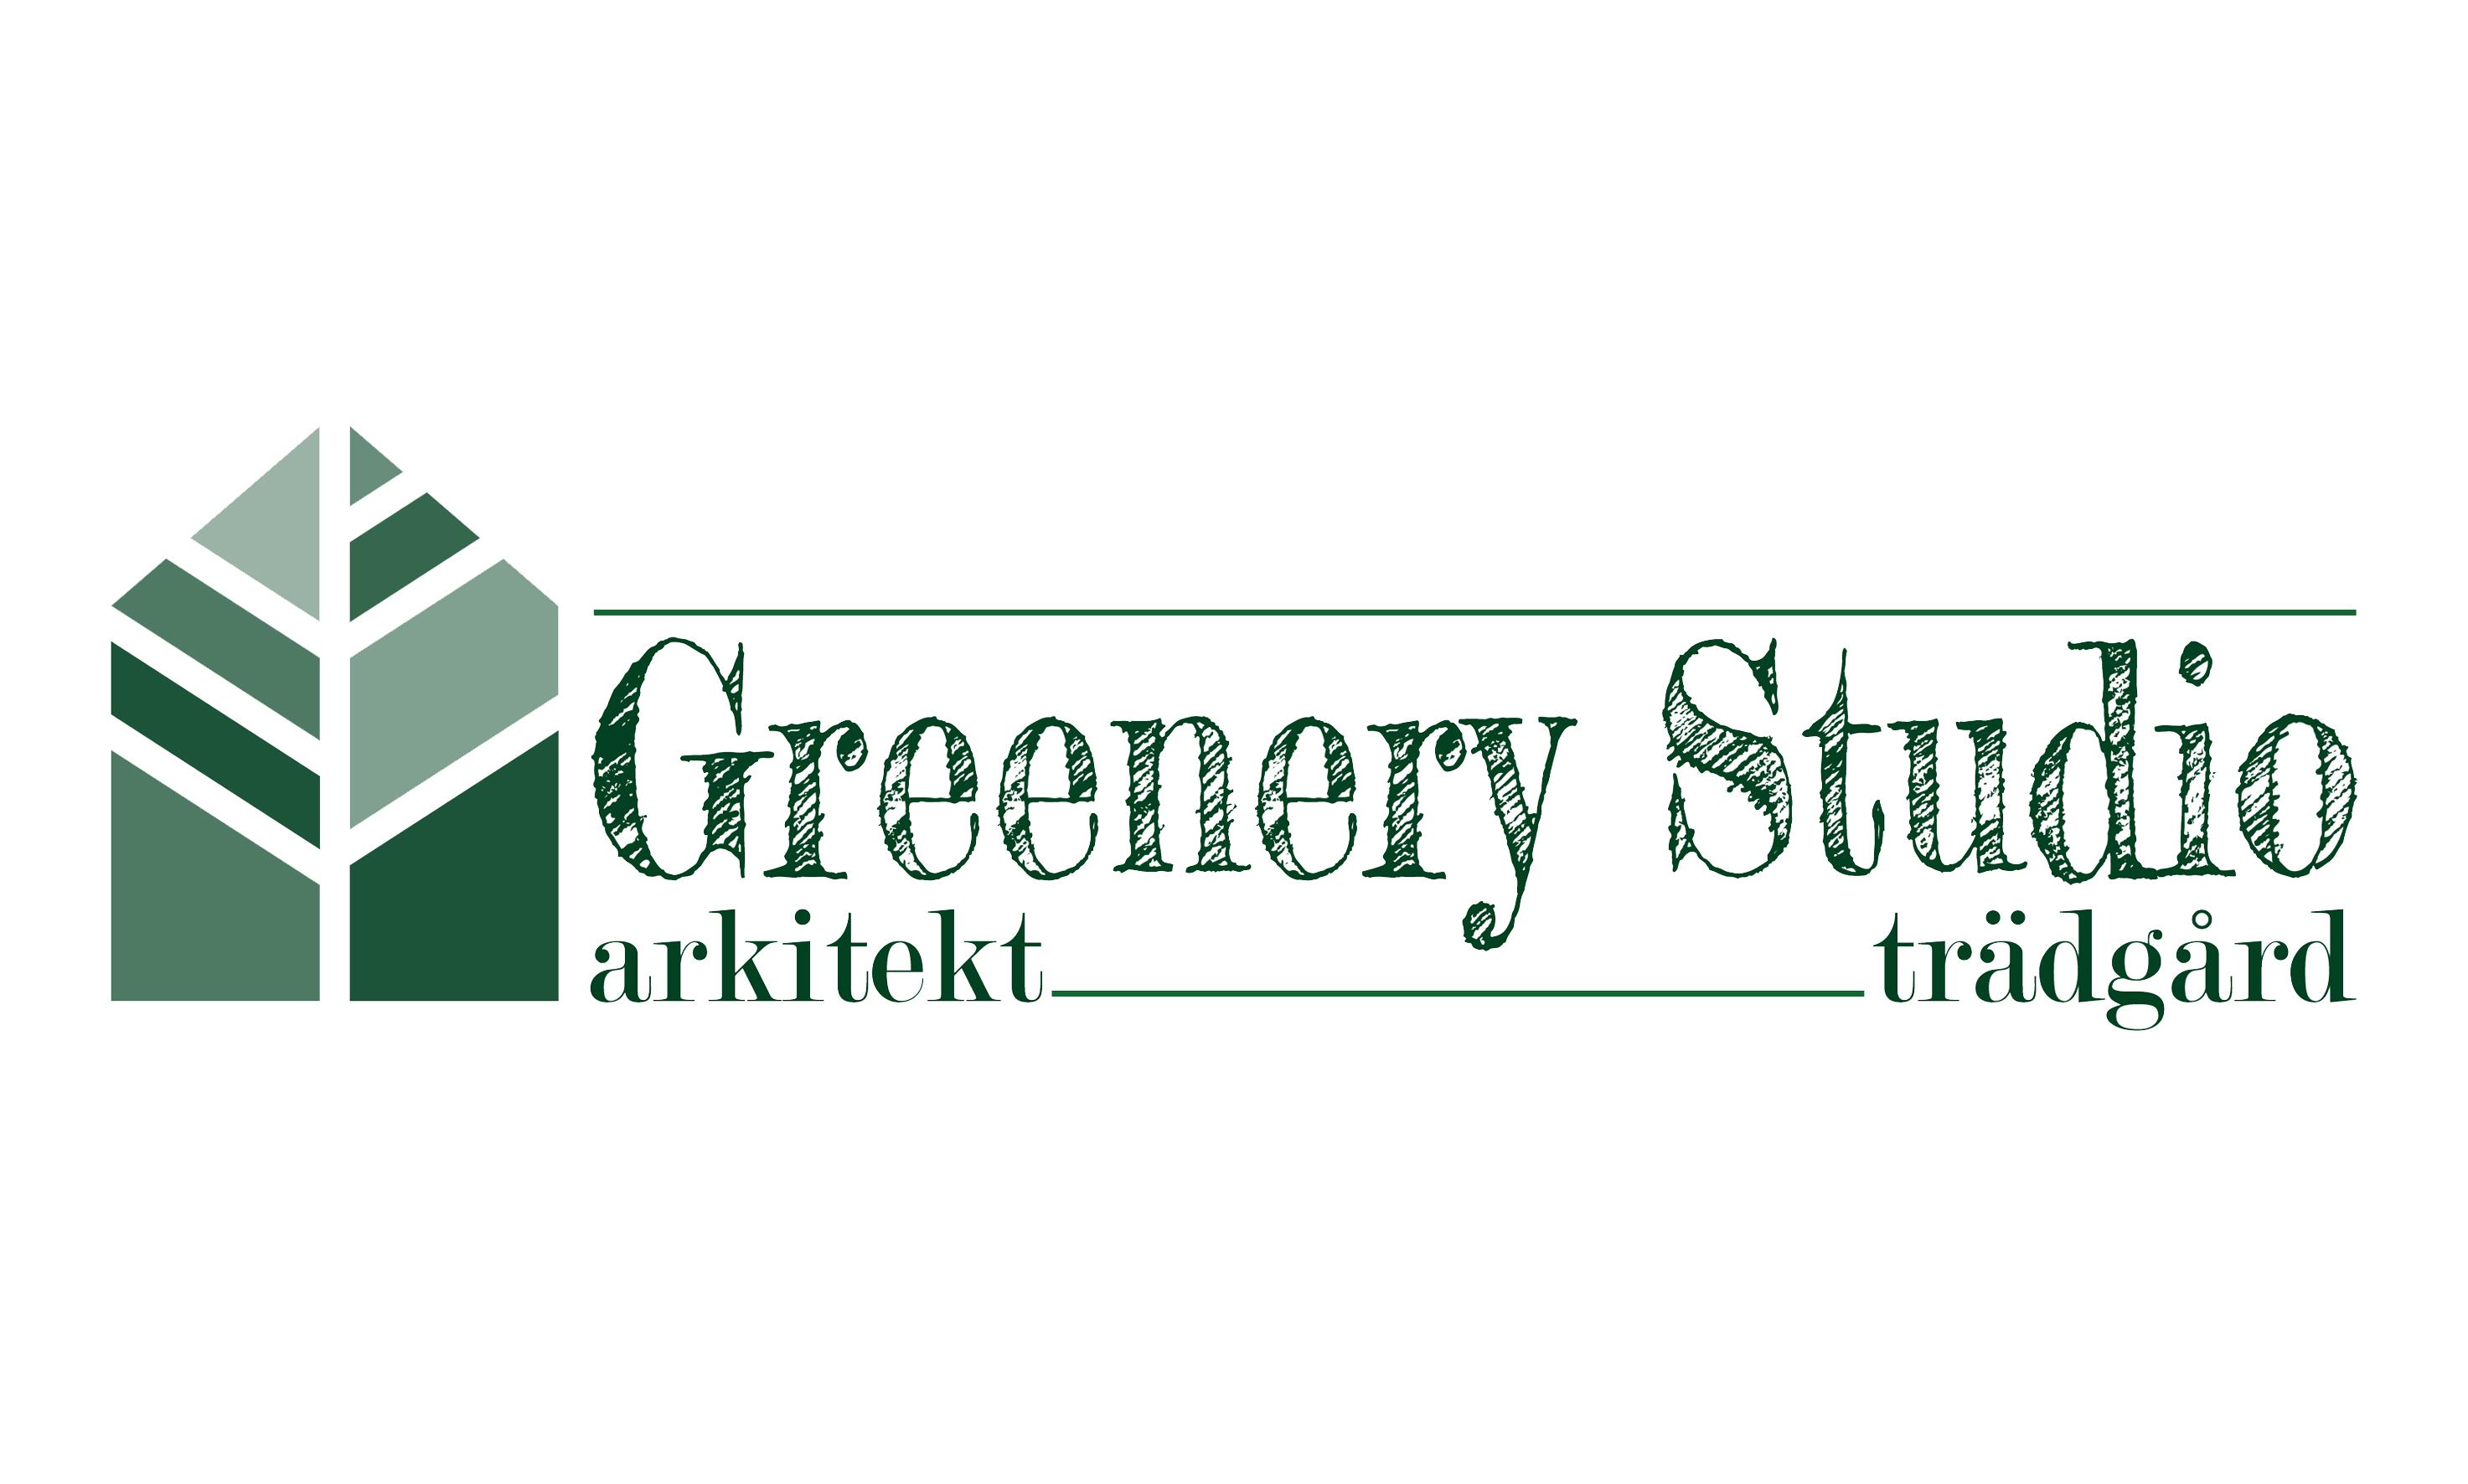 GREENERY STODIO FINAL LOGO